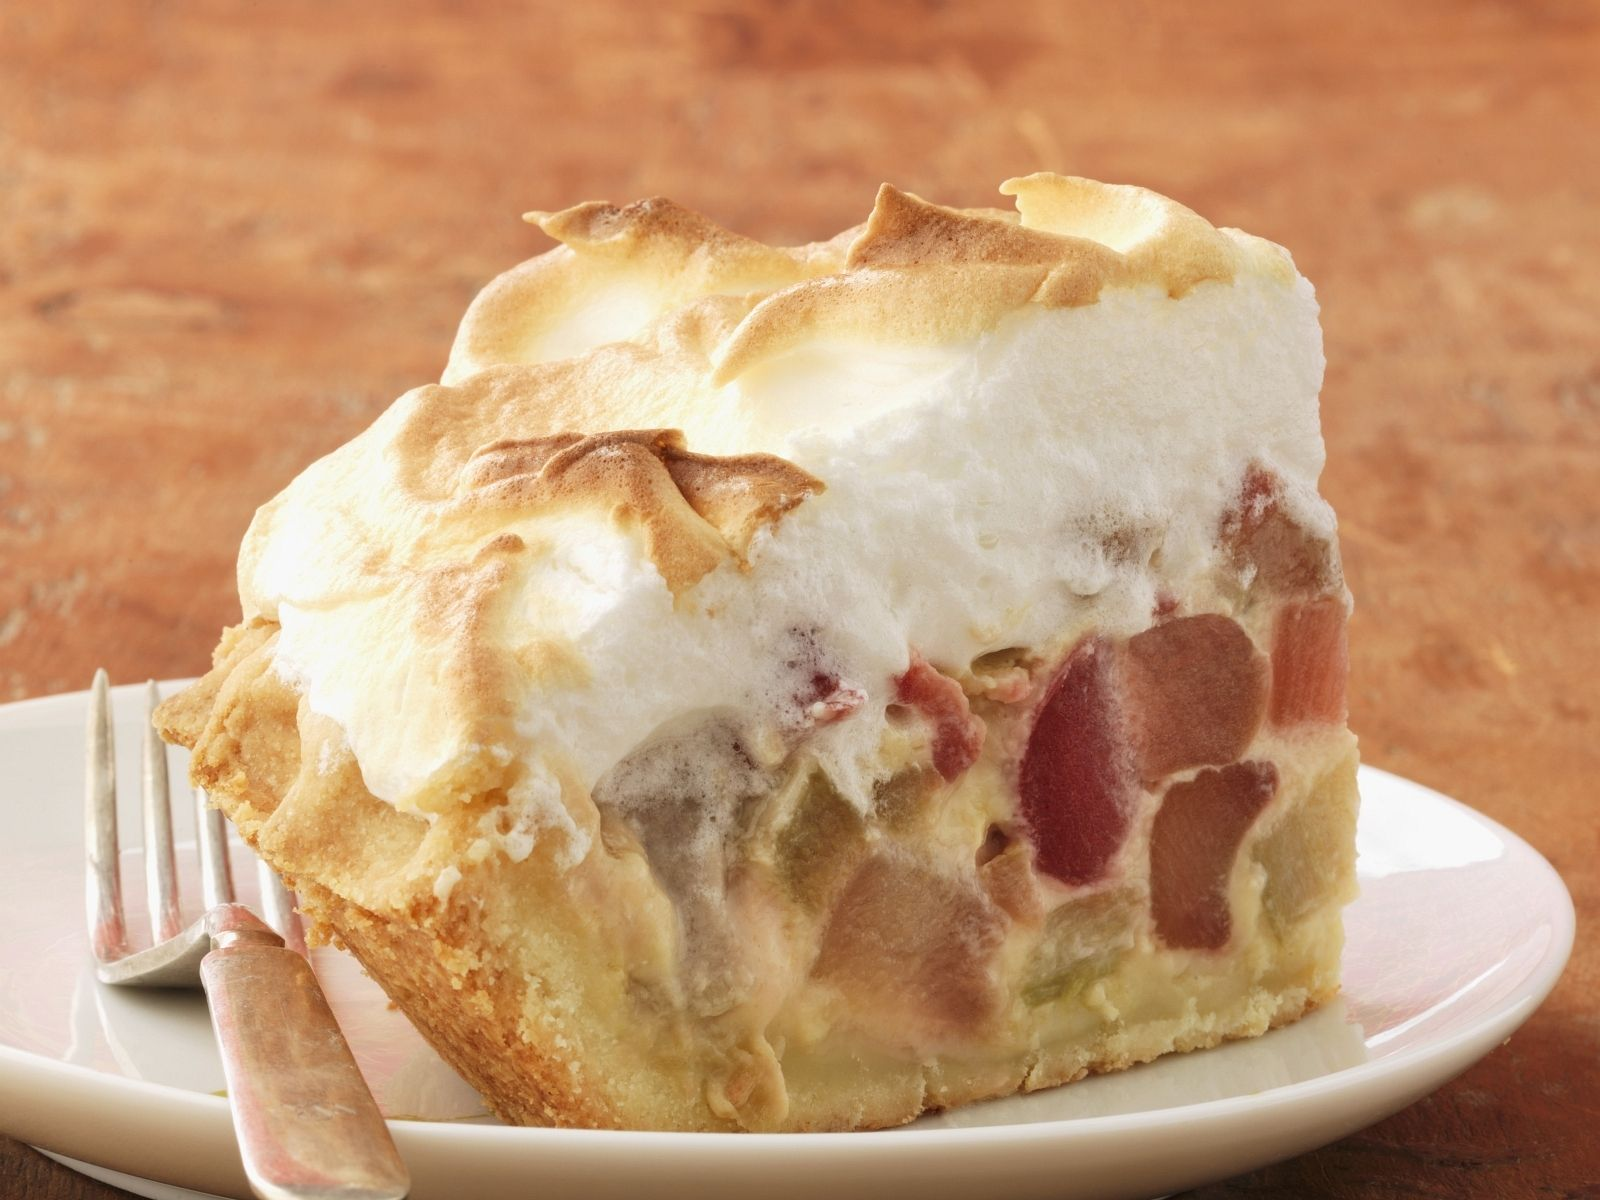 Rhabarber Baiser Kuchen Recette Food Cakes Muffins Cookies Co Rhabarber Baiser Kuchen Baiser Kuchen Et Rezepte